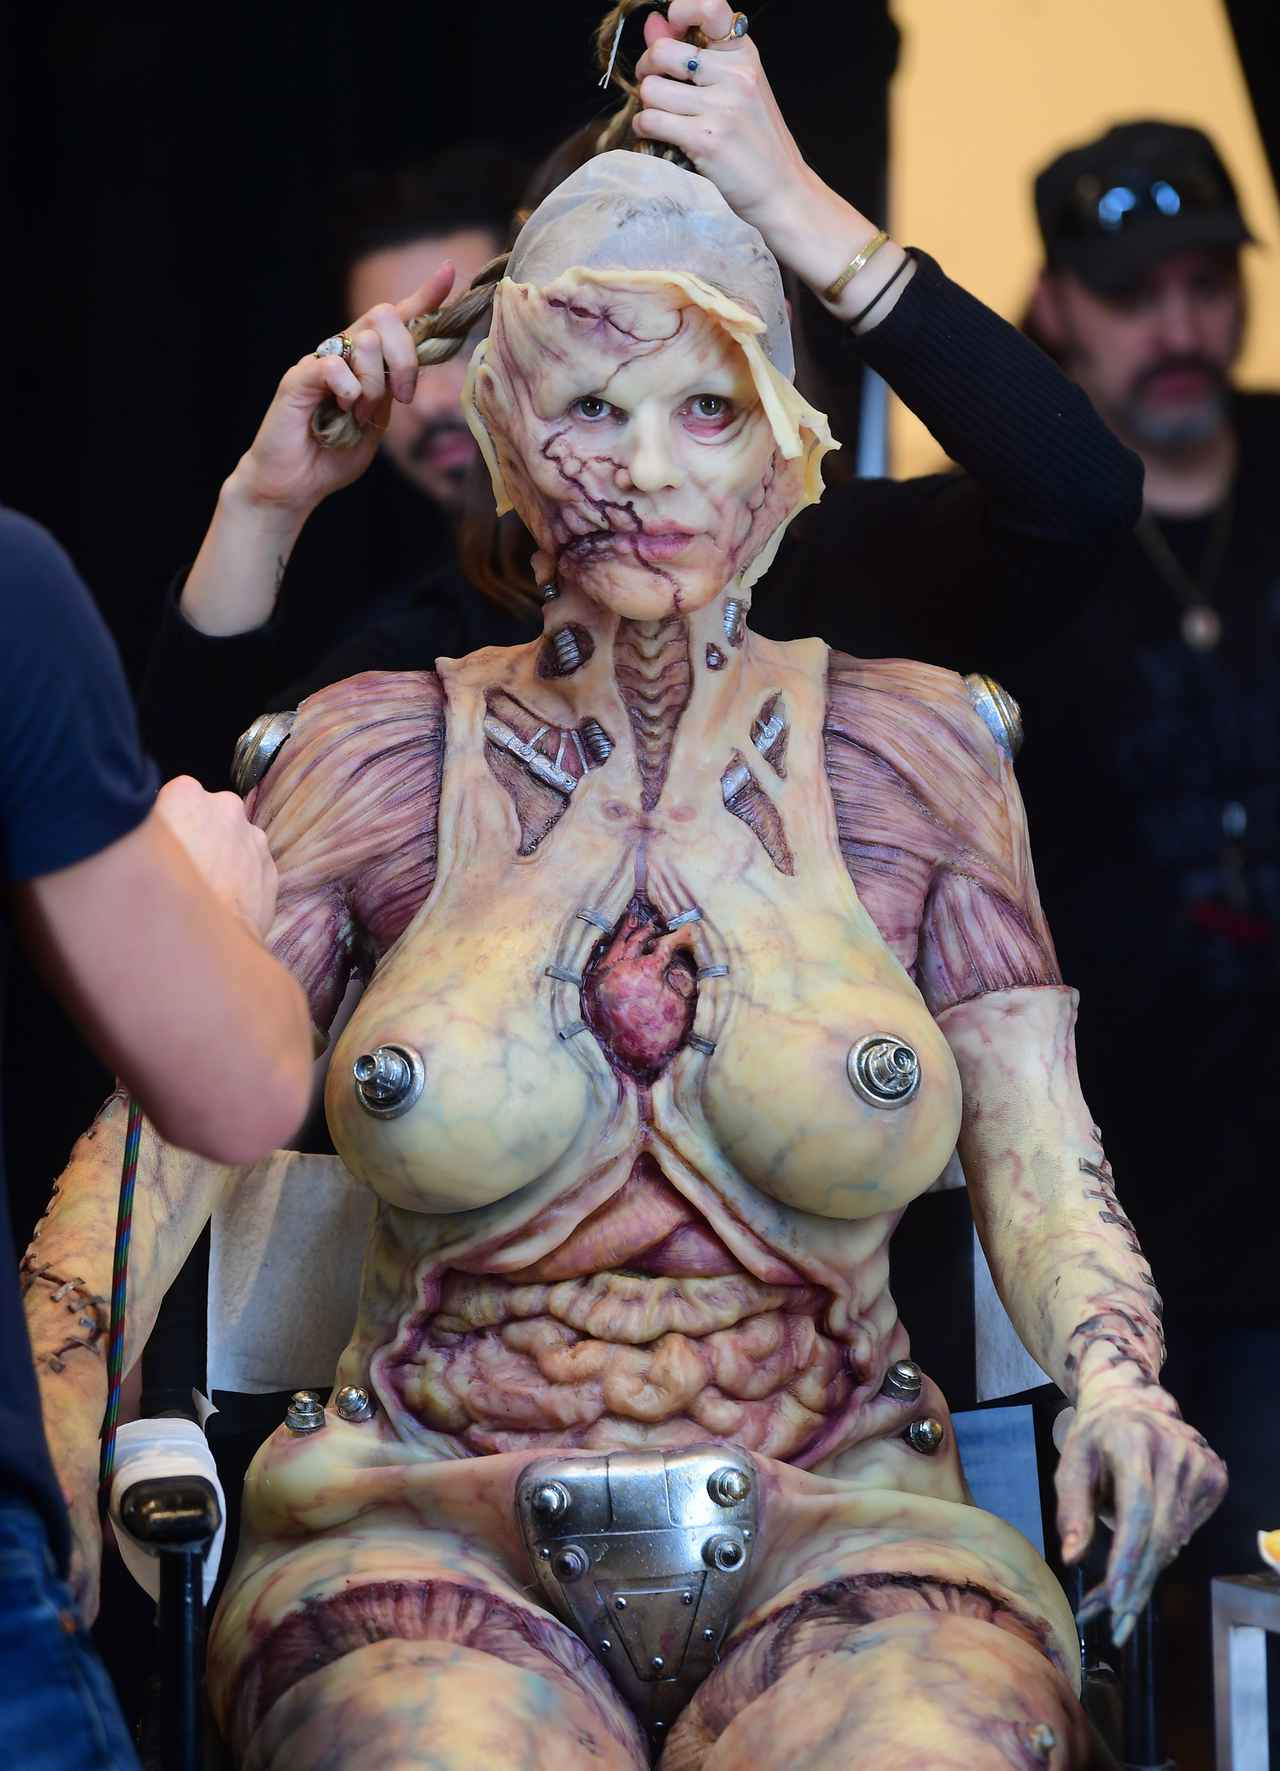 Images : 9番目の画像 - 「ハロウィンの女王」ハイディ・クルムの仮装が怖すぎる - フロントロウ -海外セレブ情報を発信